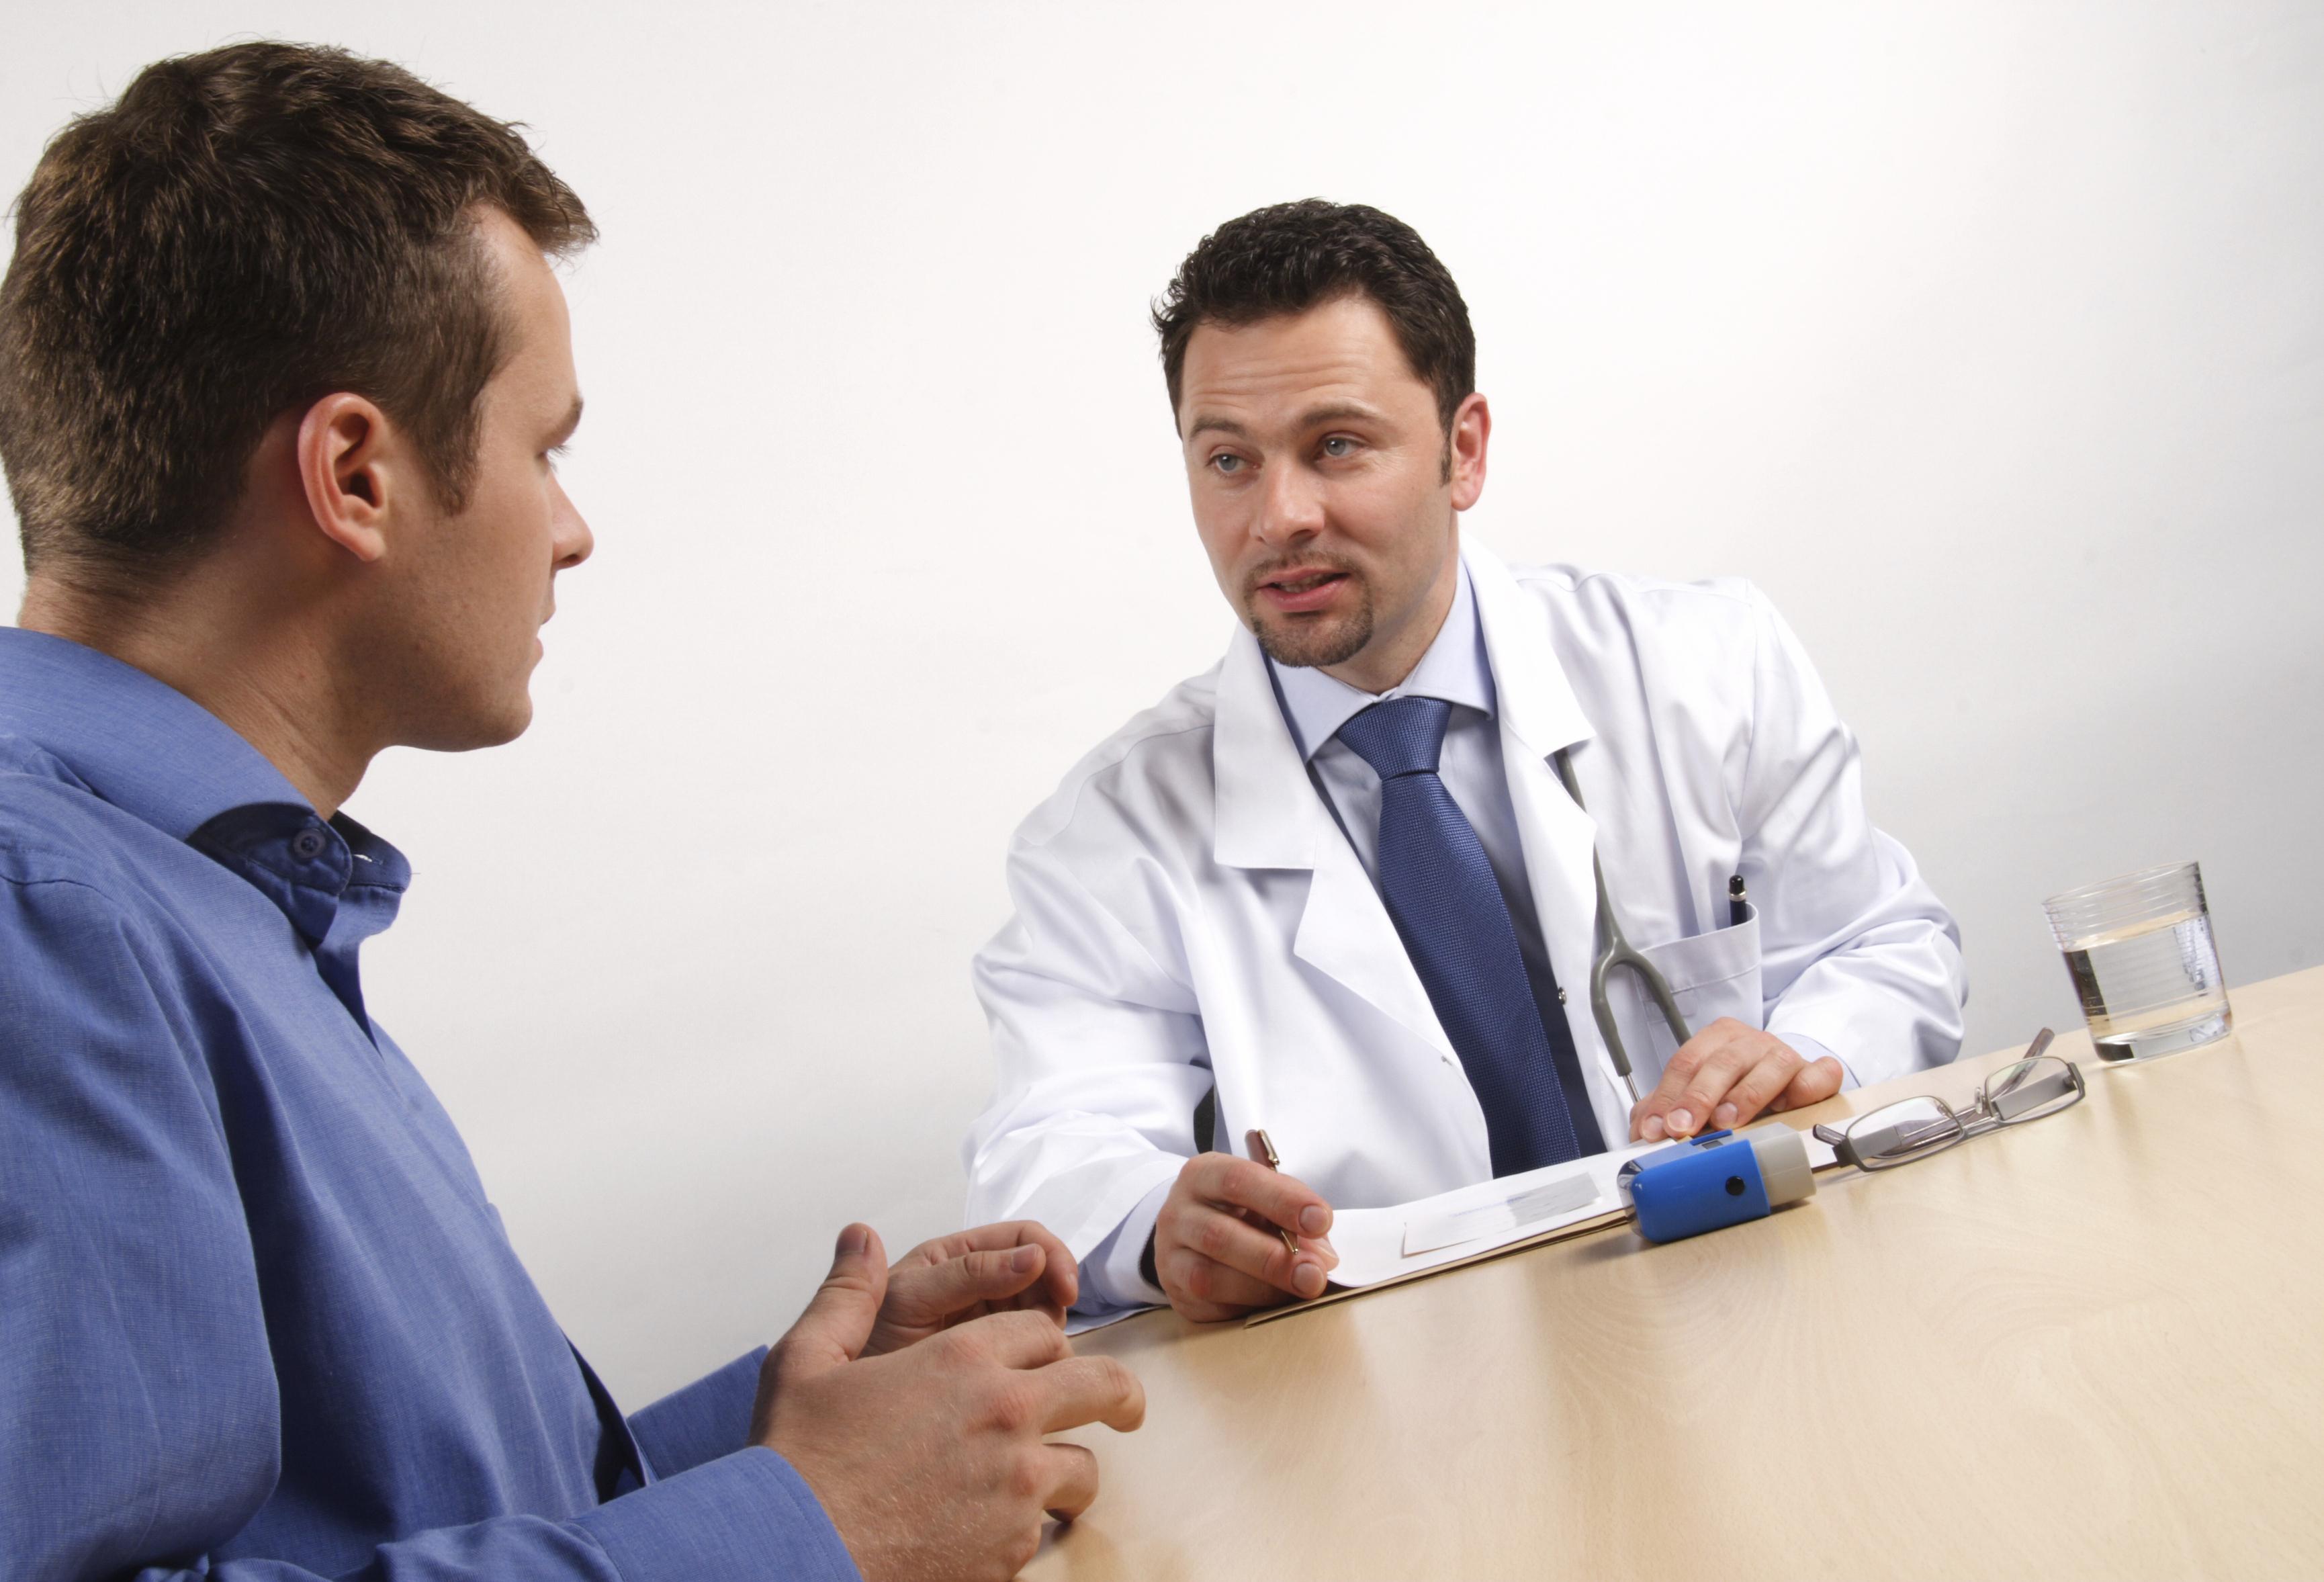 врач говорит